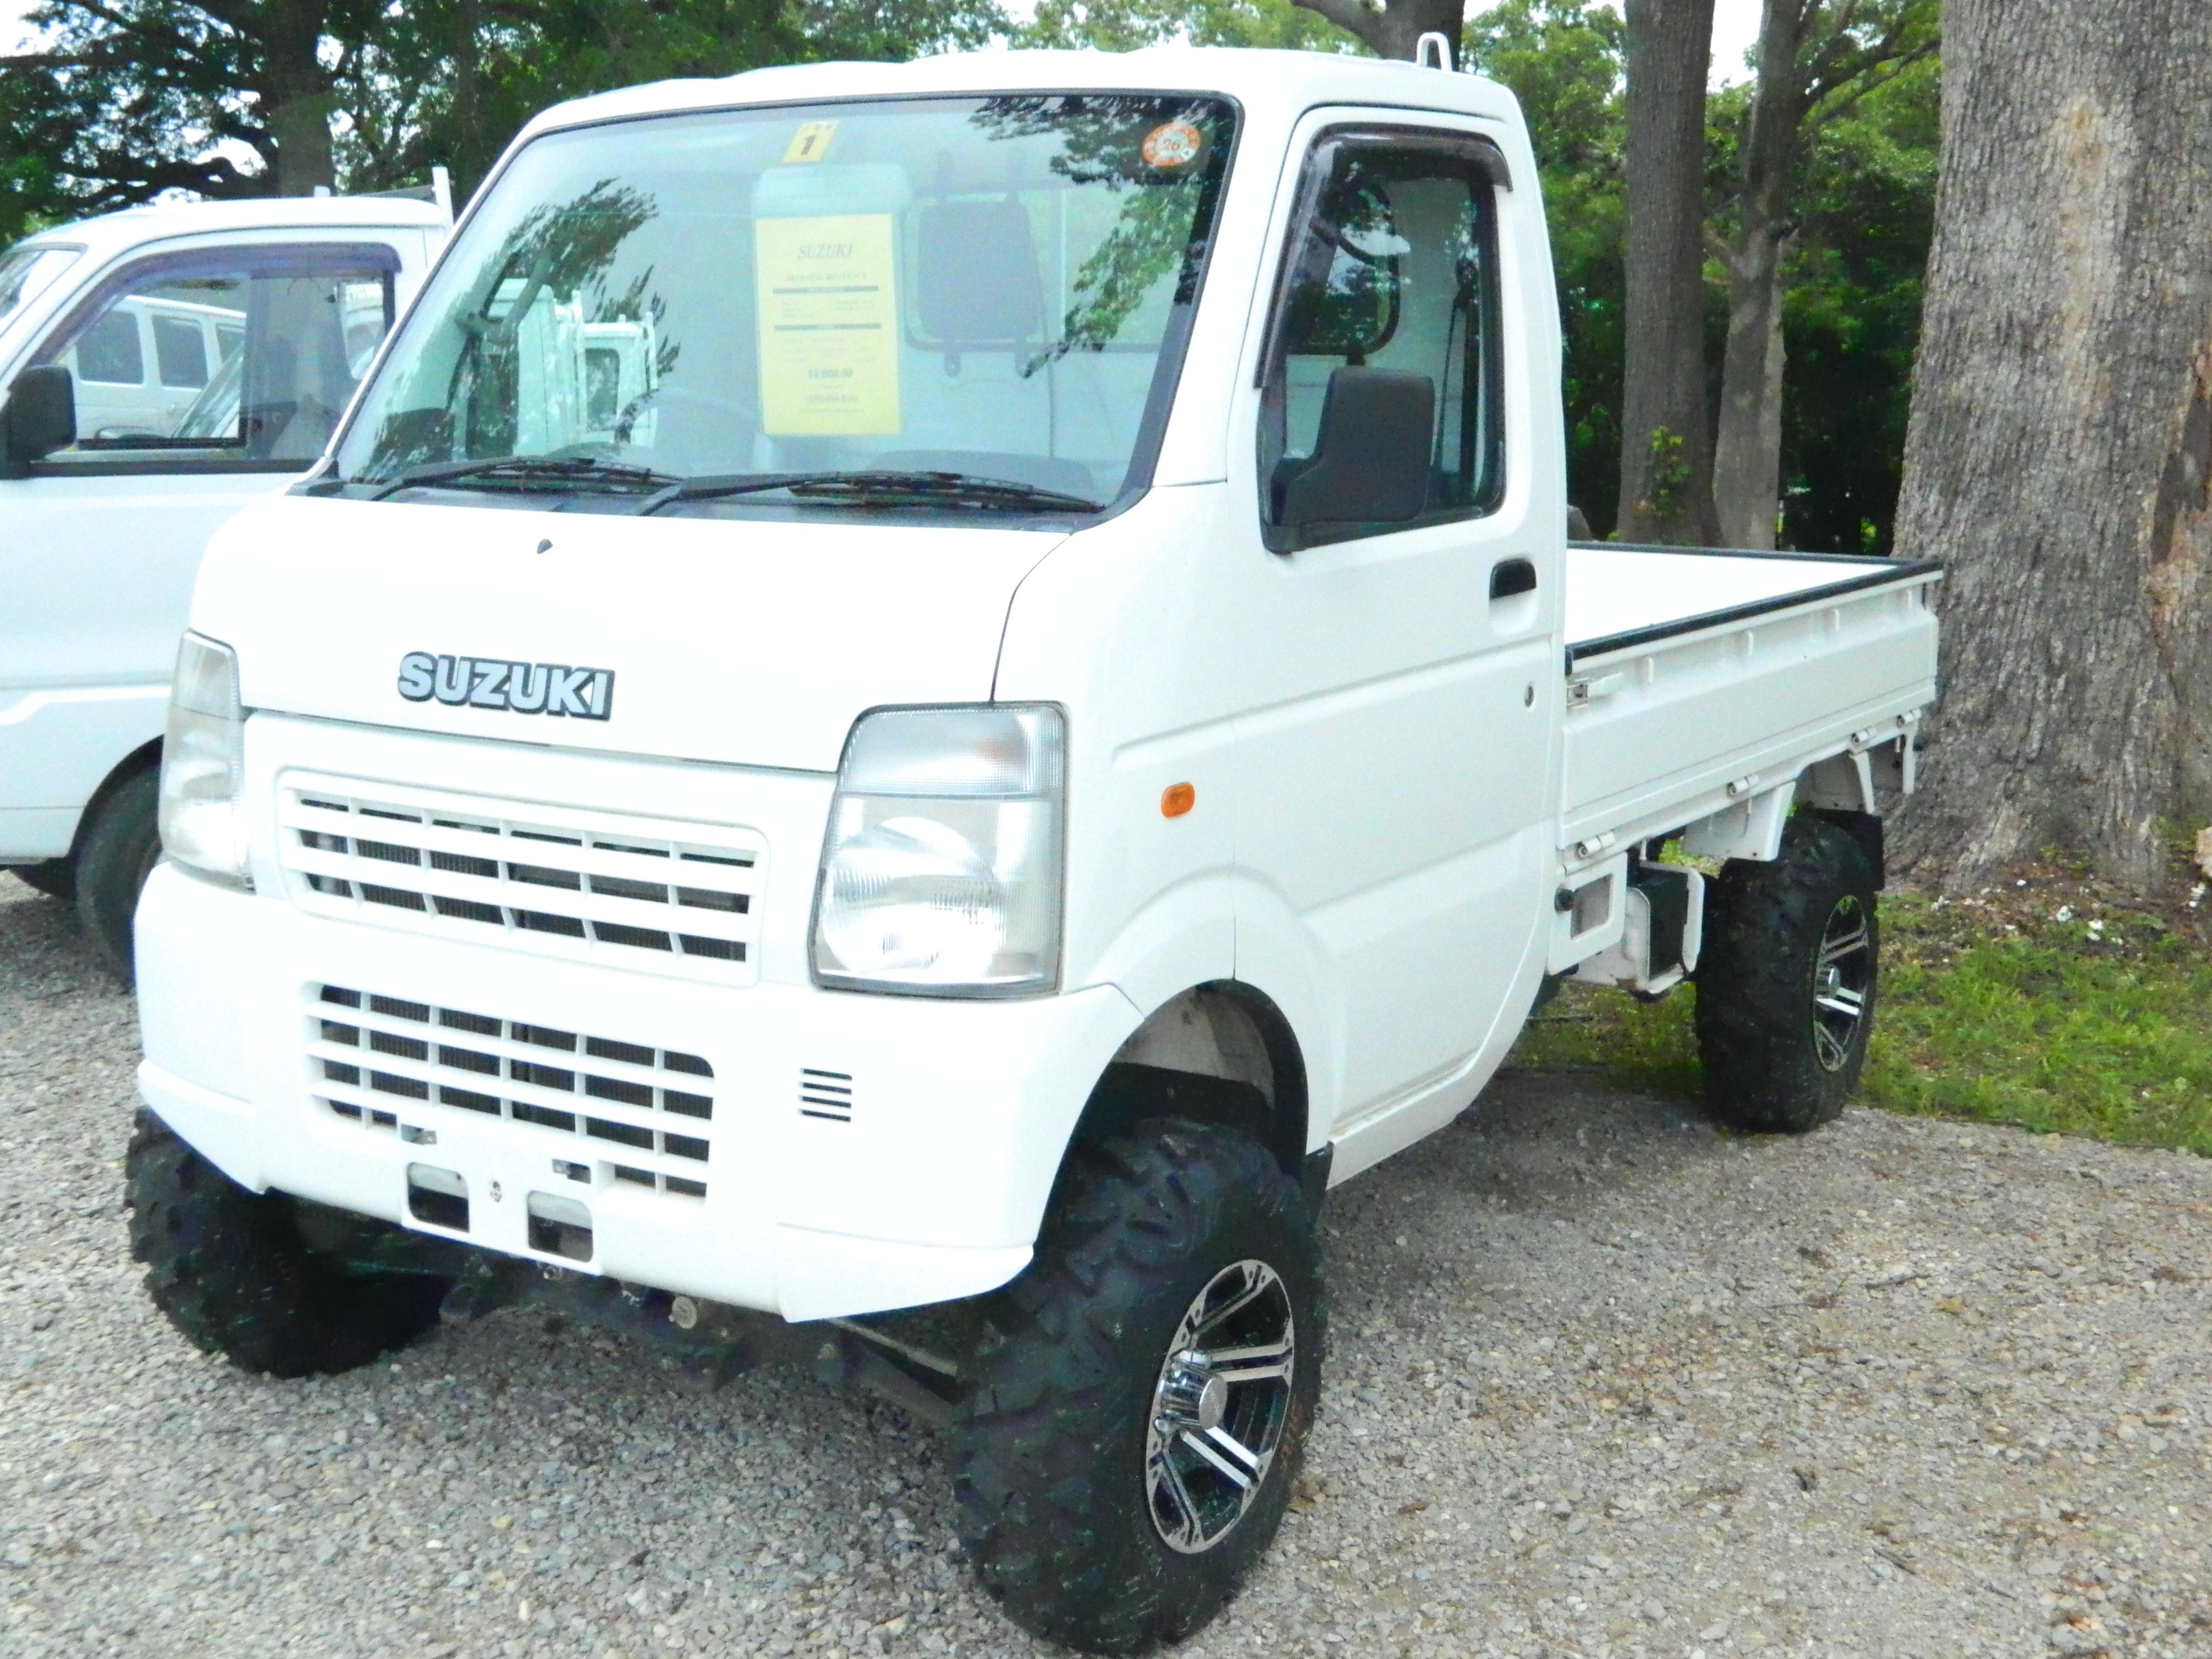 Suzuki Mini Trucks For Sale Ontario